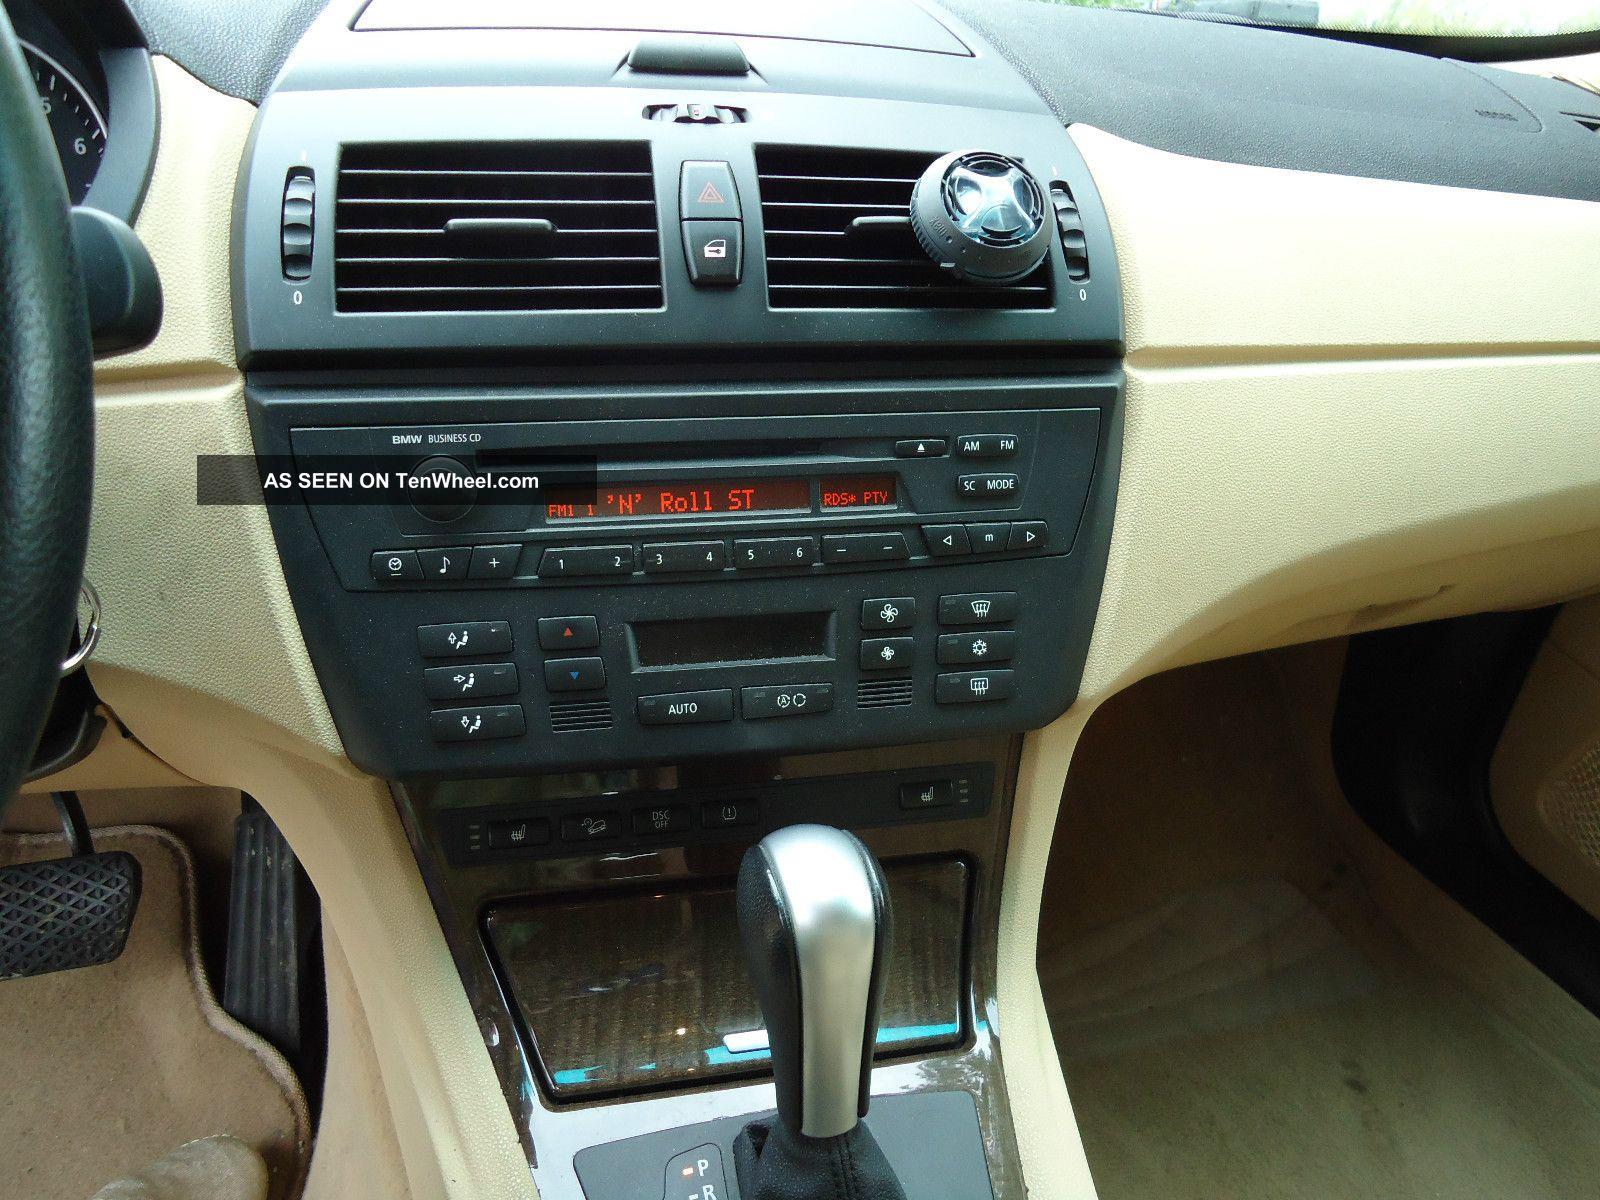 2005 Bmw X3 3. 0i Sport Utility 4 - Door 3. 0l